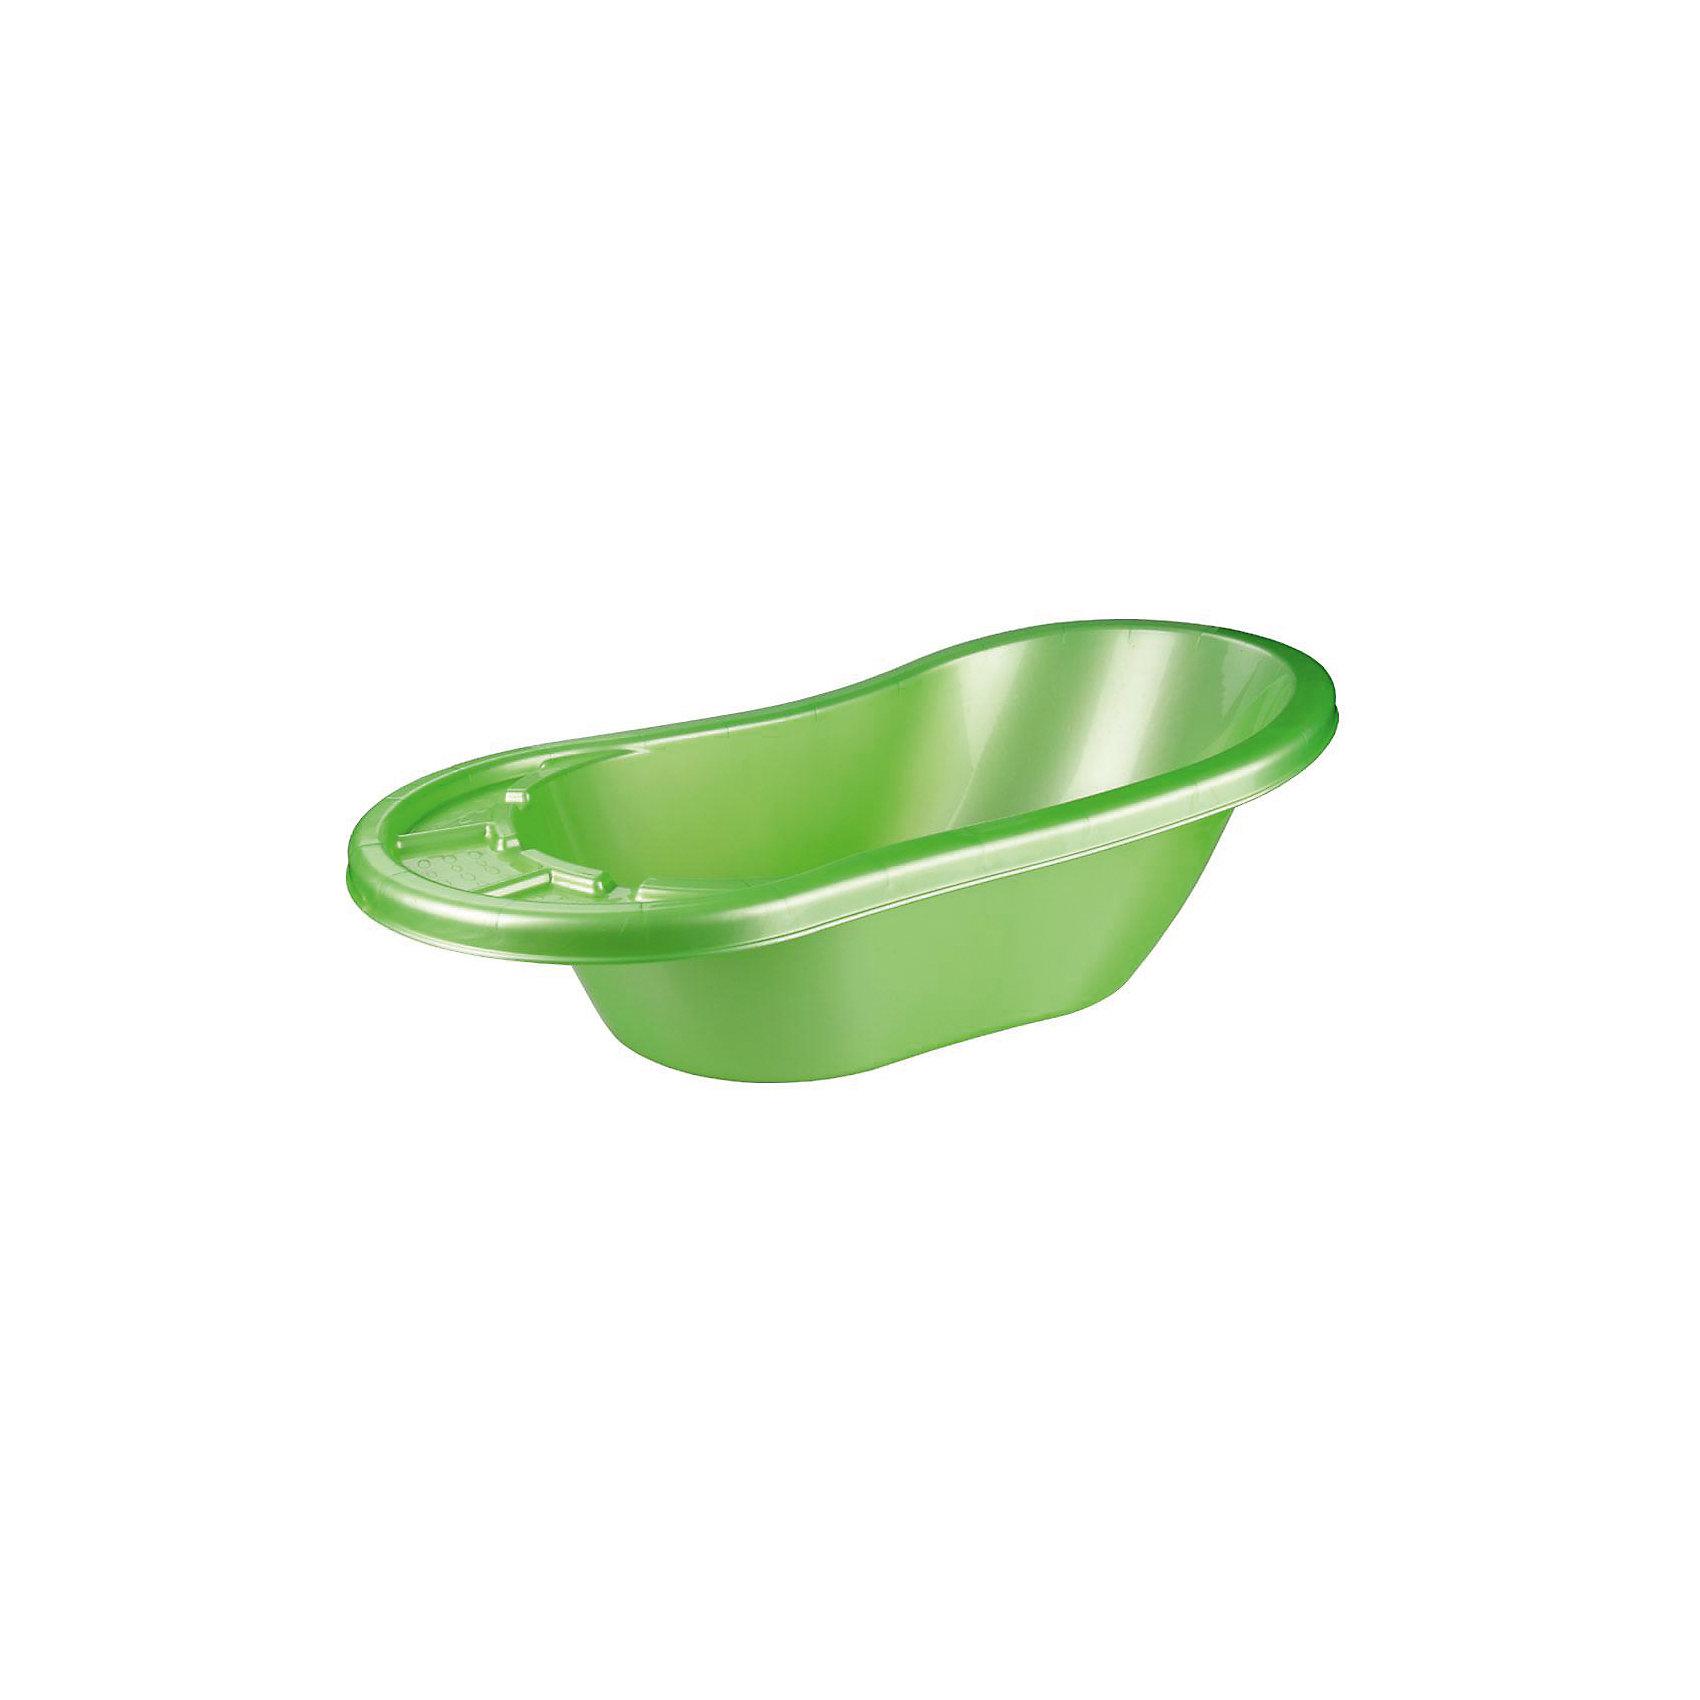 Alternativa Ванночка Карапуз, Alternativa, салатовый alternativa горка для купания alternativa розовый